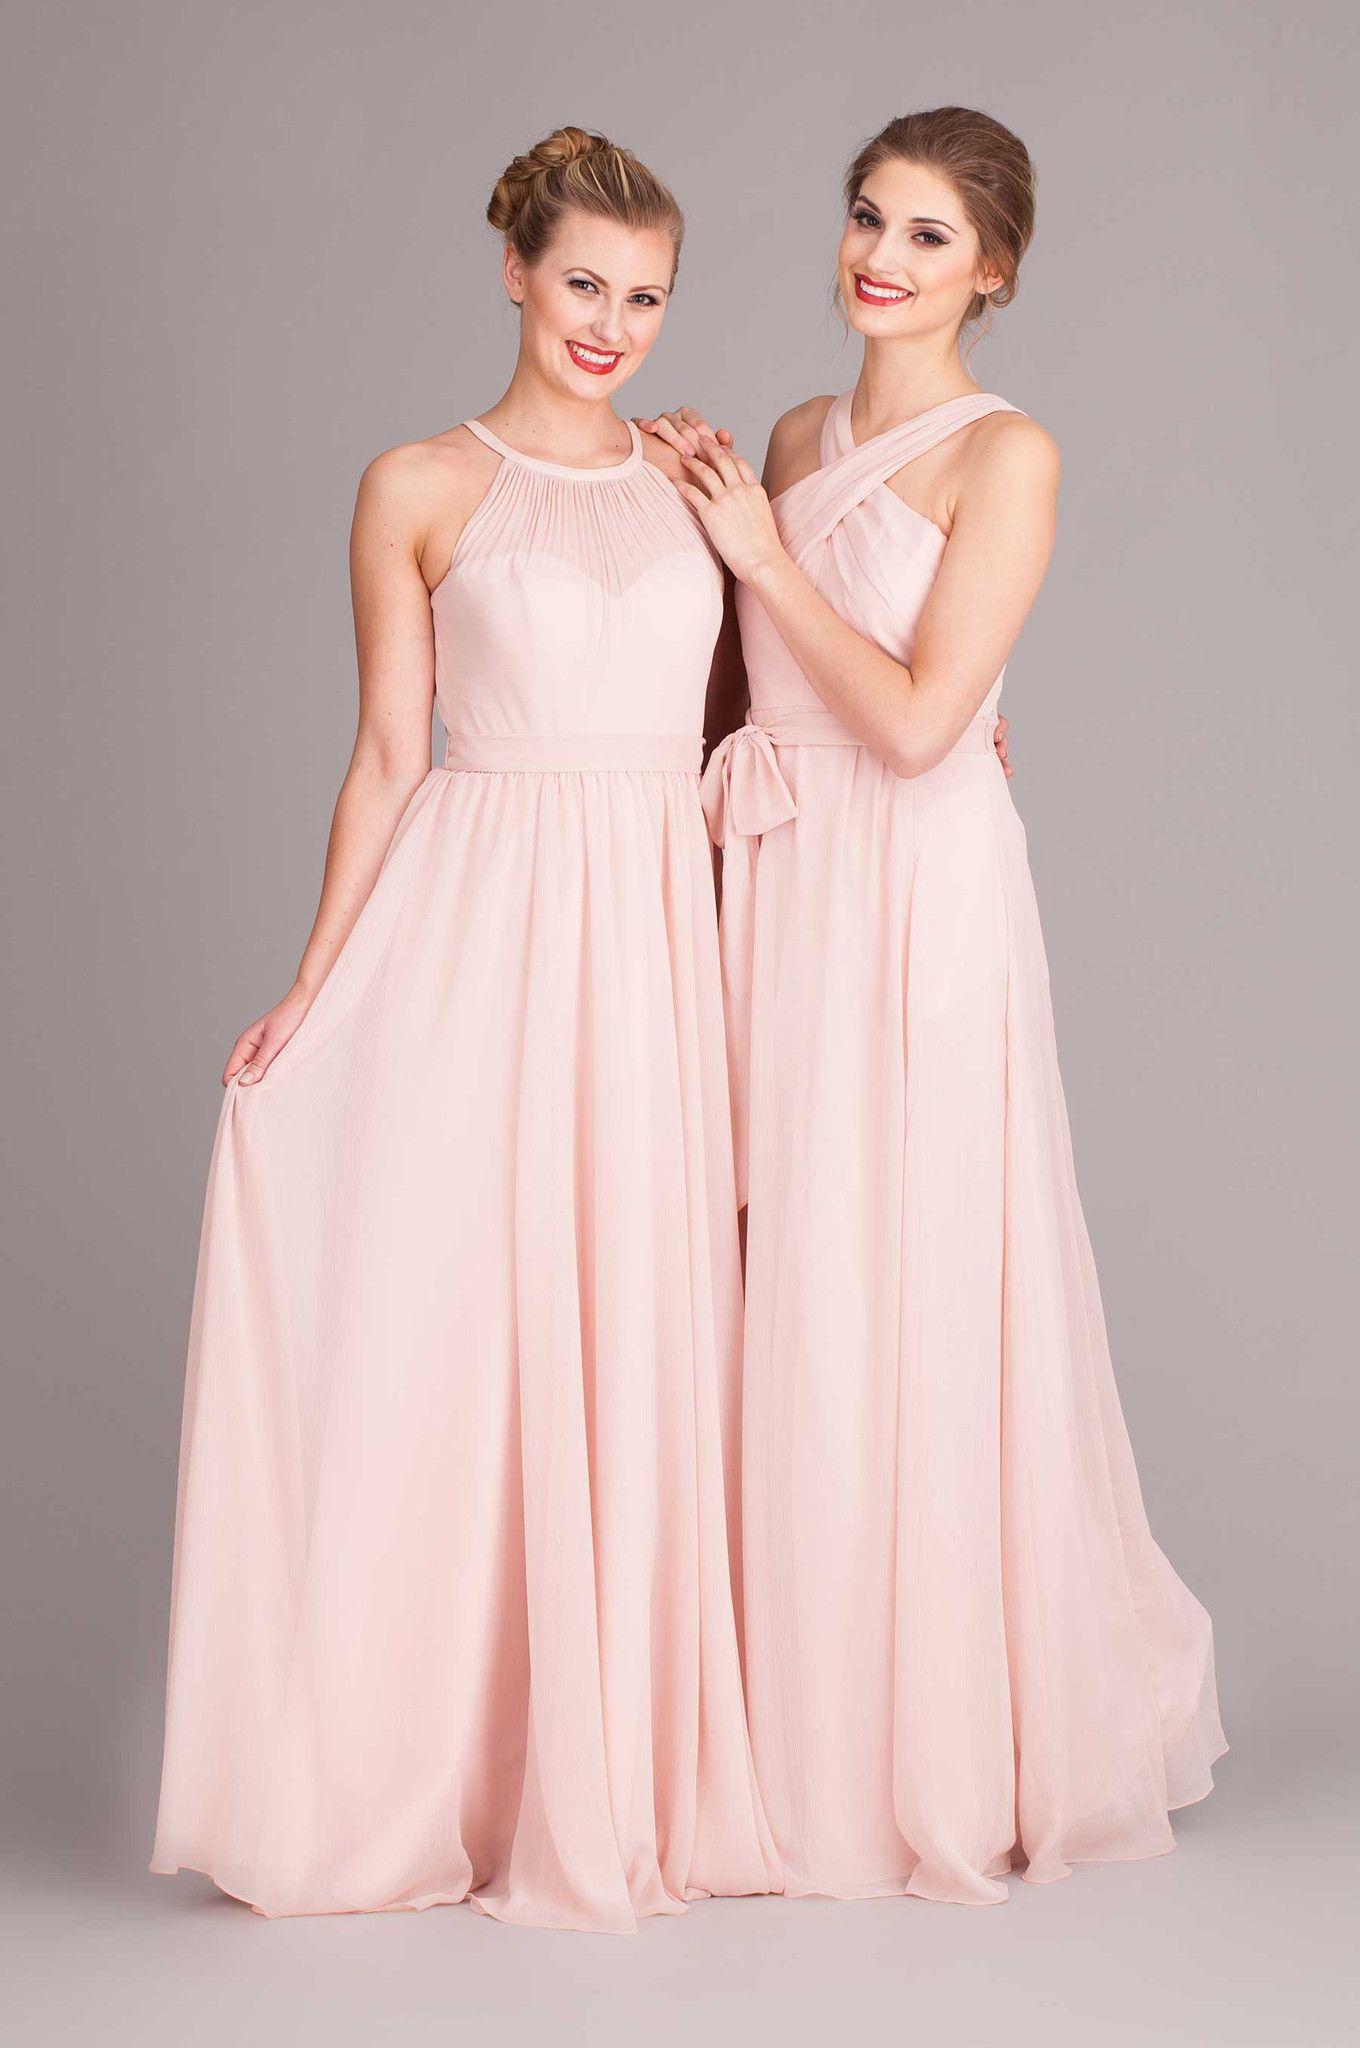 New Kennedy Blue Blush Bridesmaids Dresses #KennedyBlue #Blush #Bridesmaids